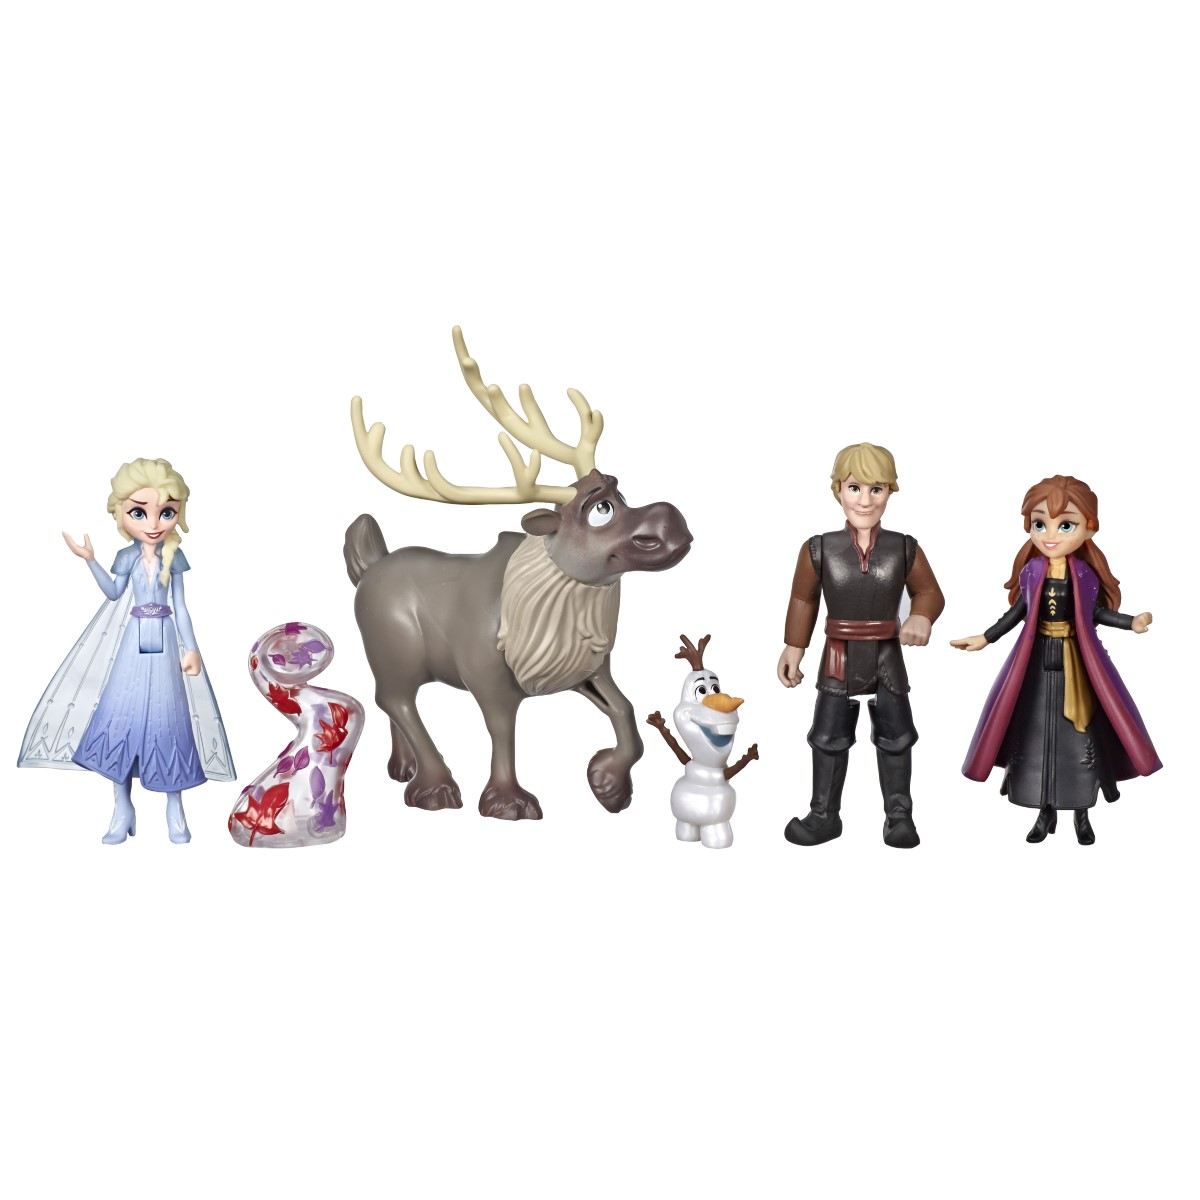 Hasbro Frozen 2 Sd Multipack